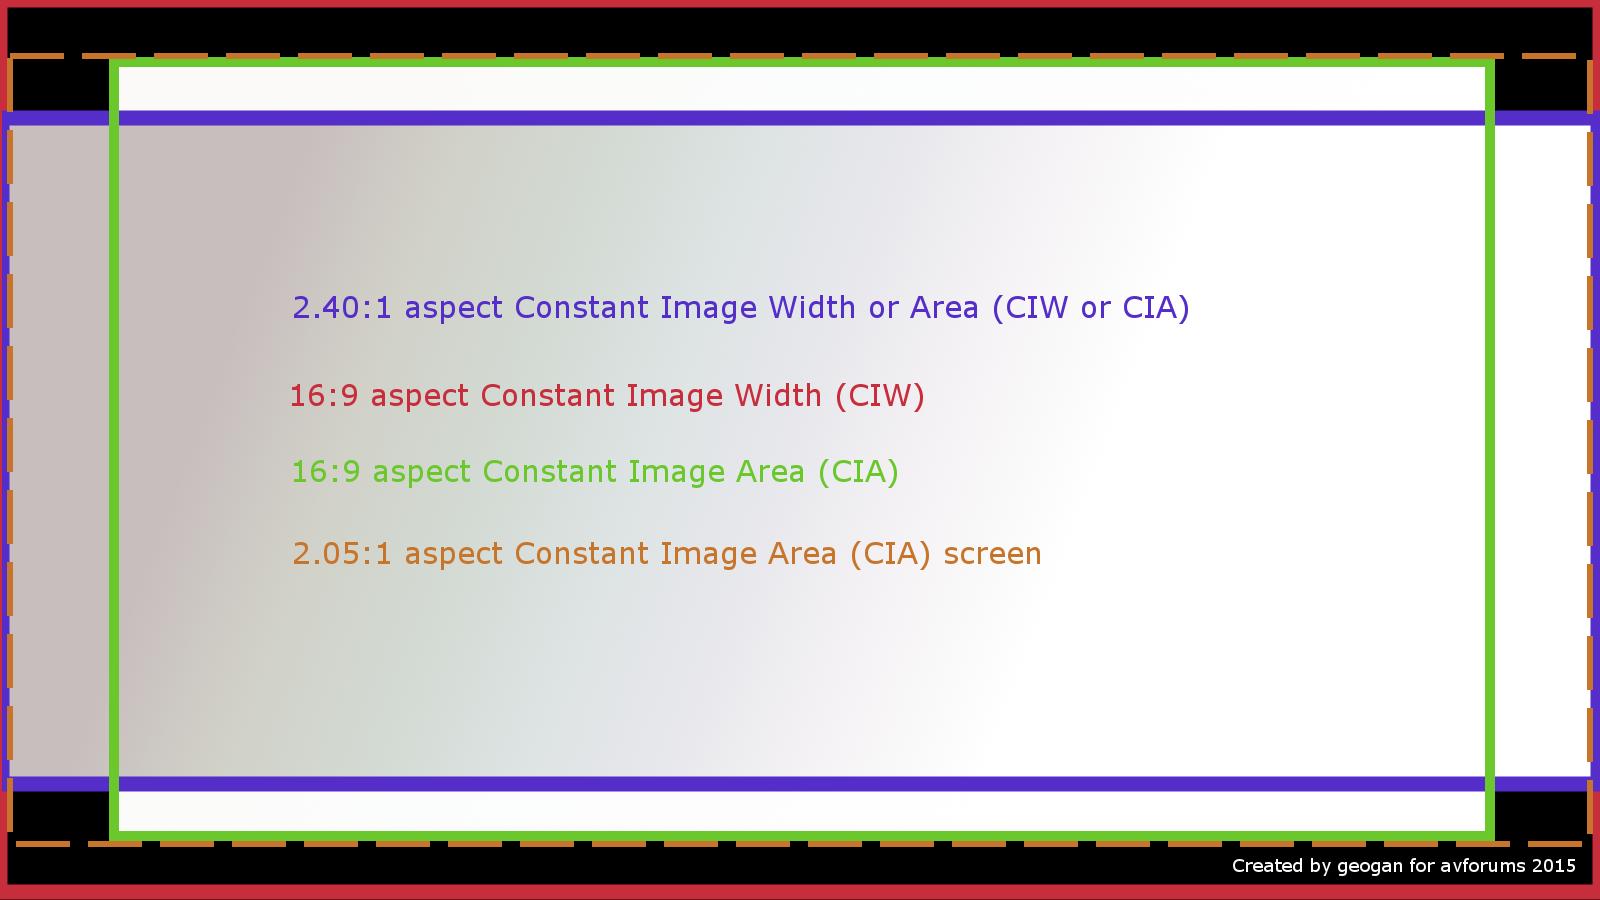 screen-dimensions.png